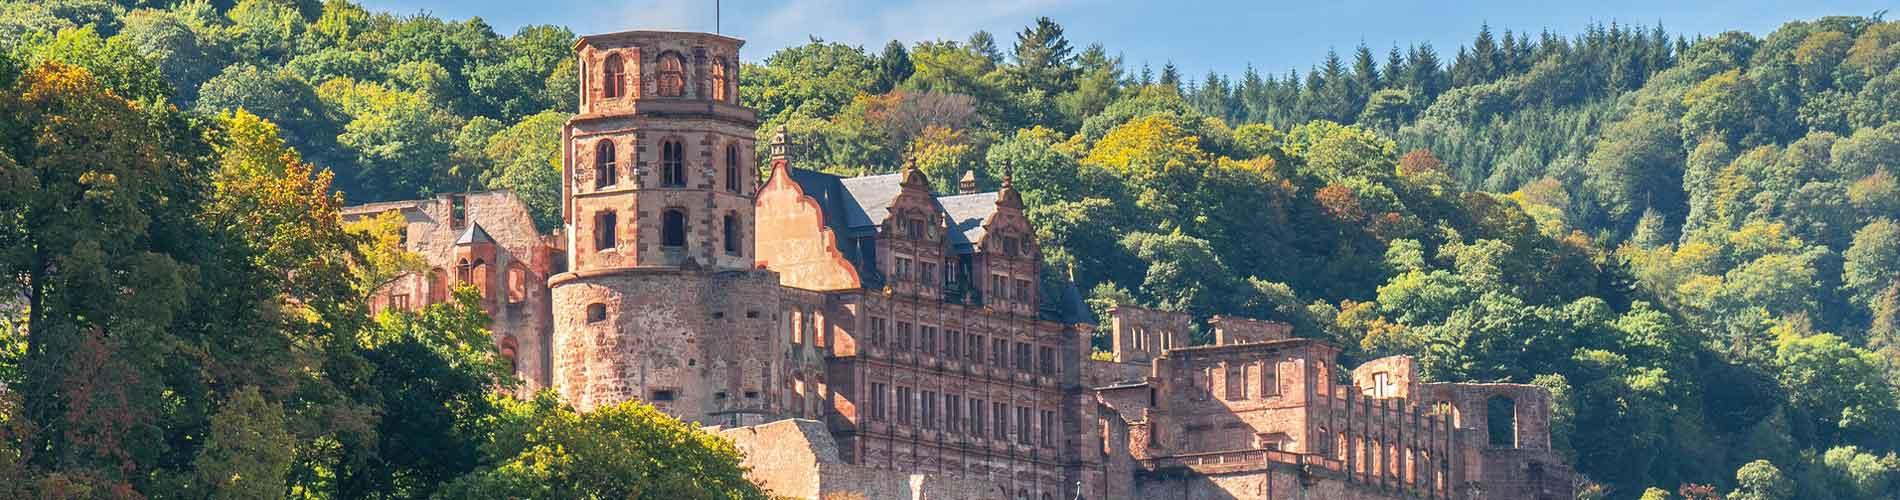 Blog_TopCastlesGermany_Heidelberg-Castle_1900x500